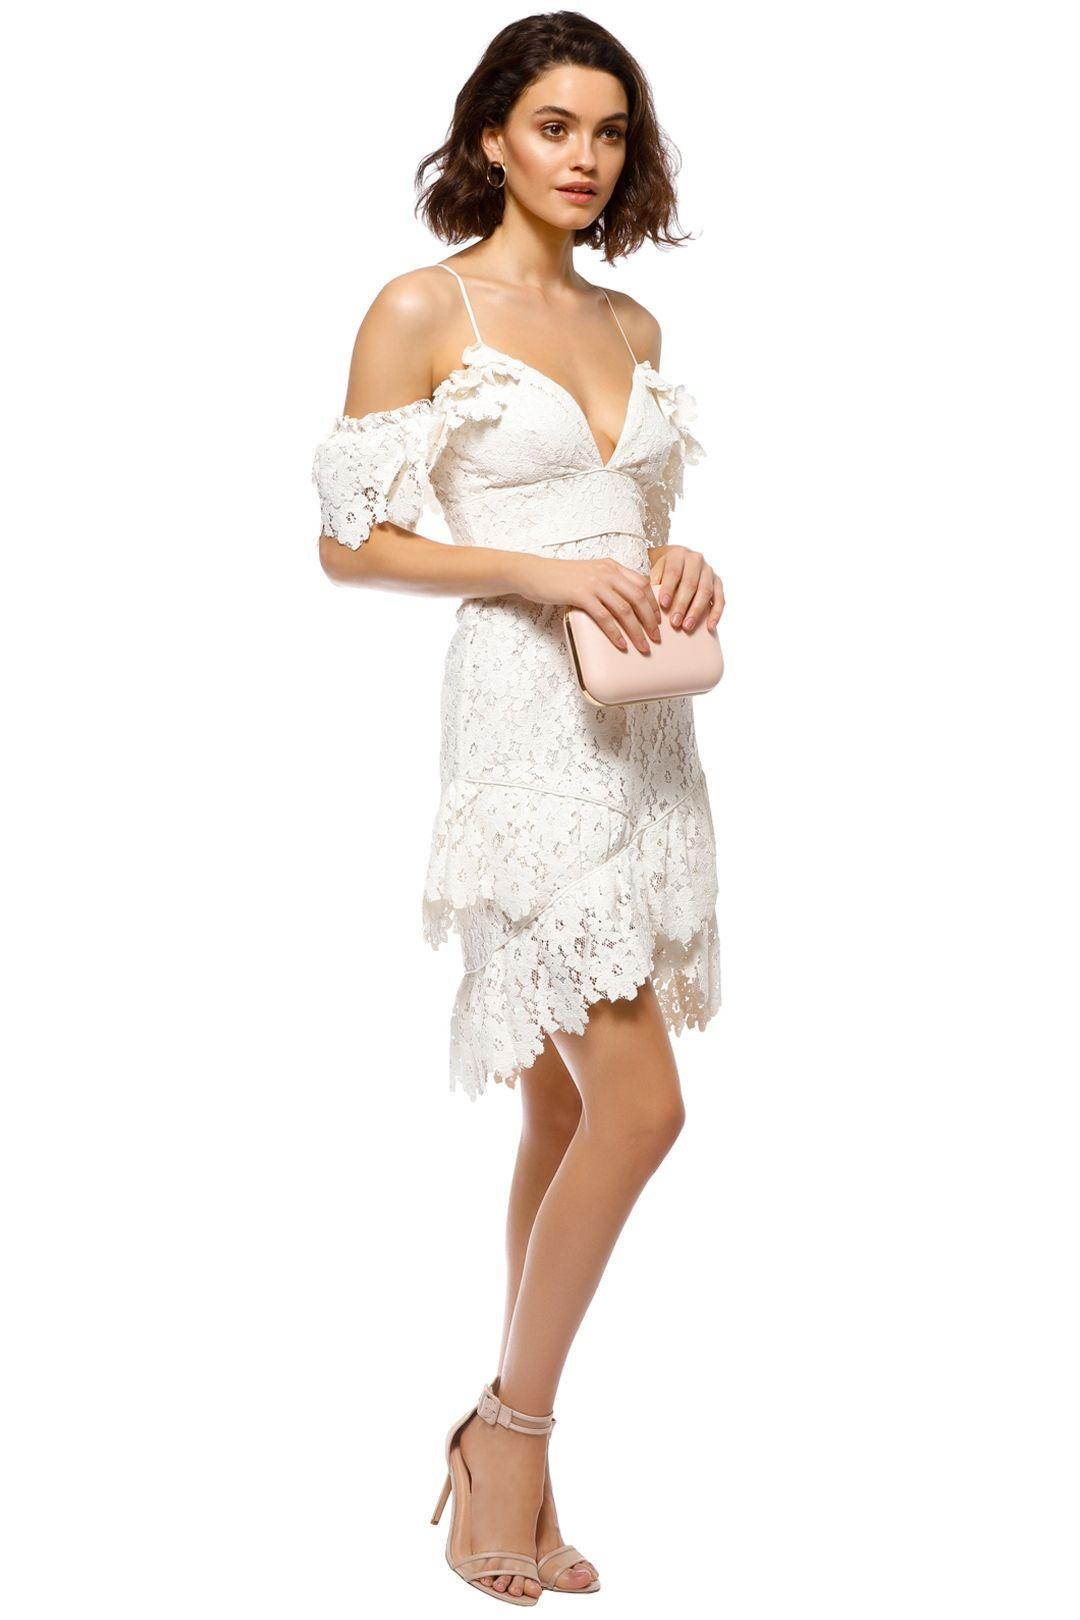 Saylor - Dana Dress - White - Side